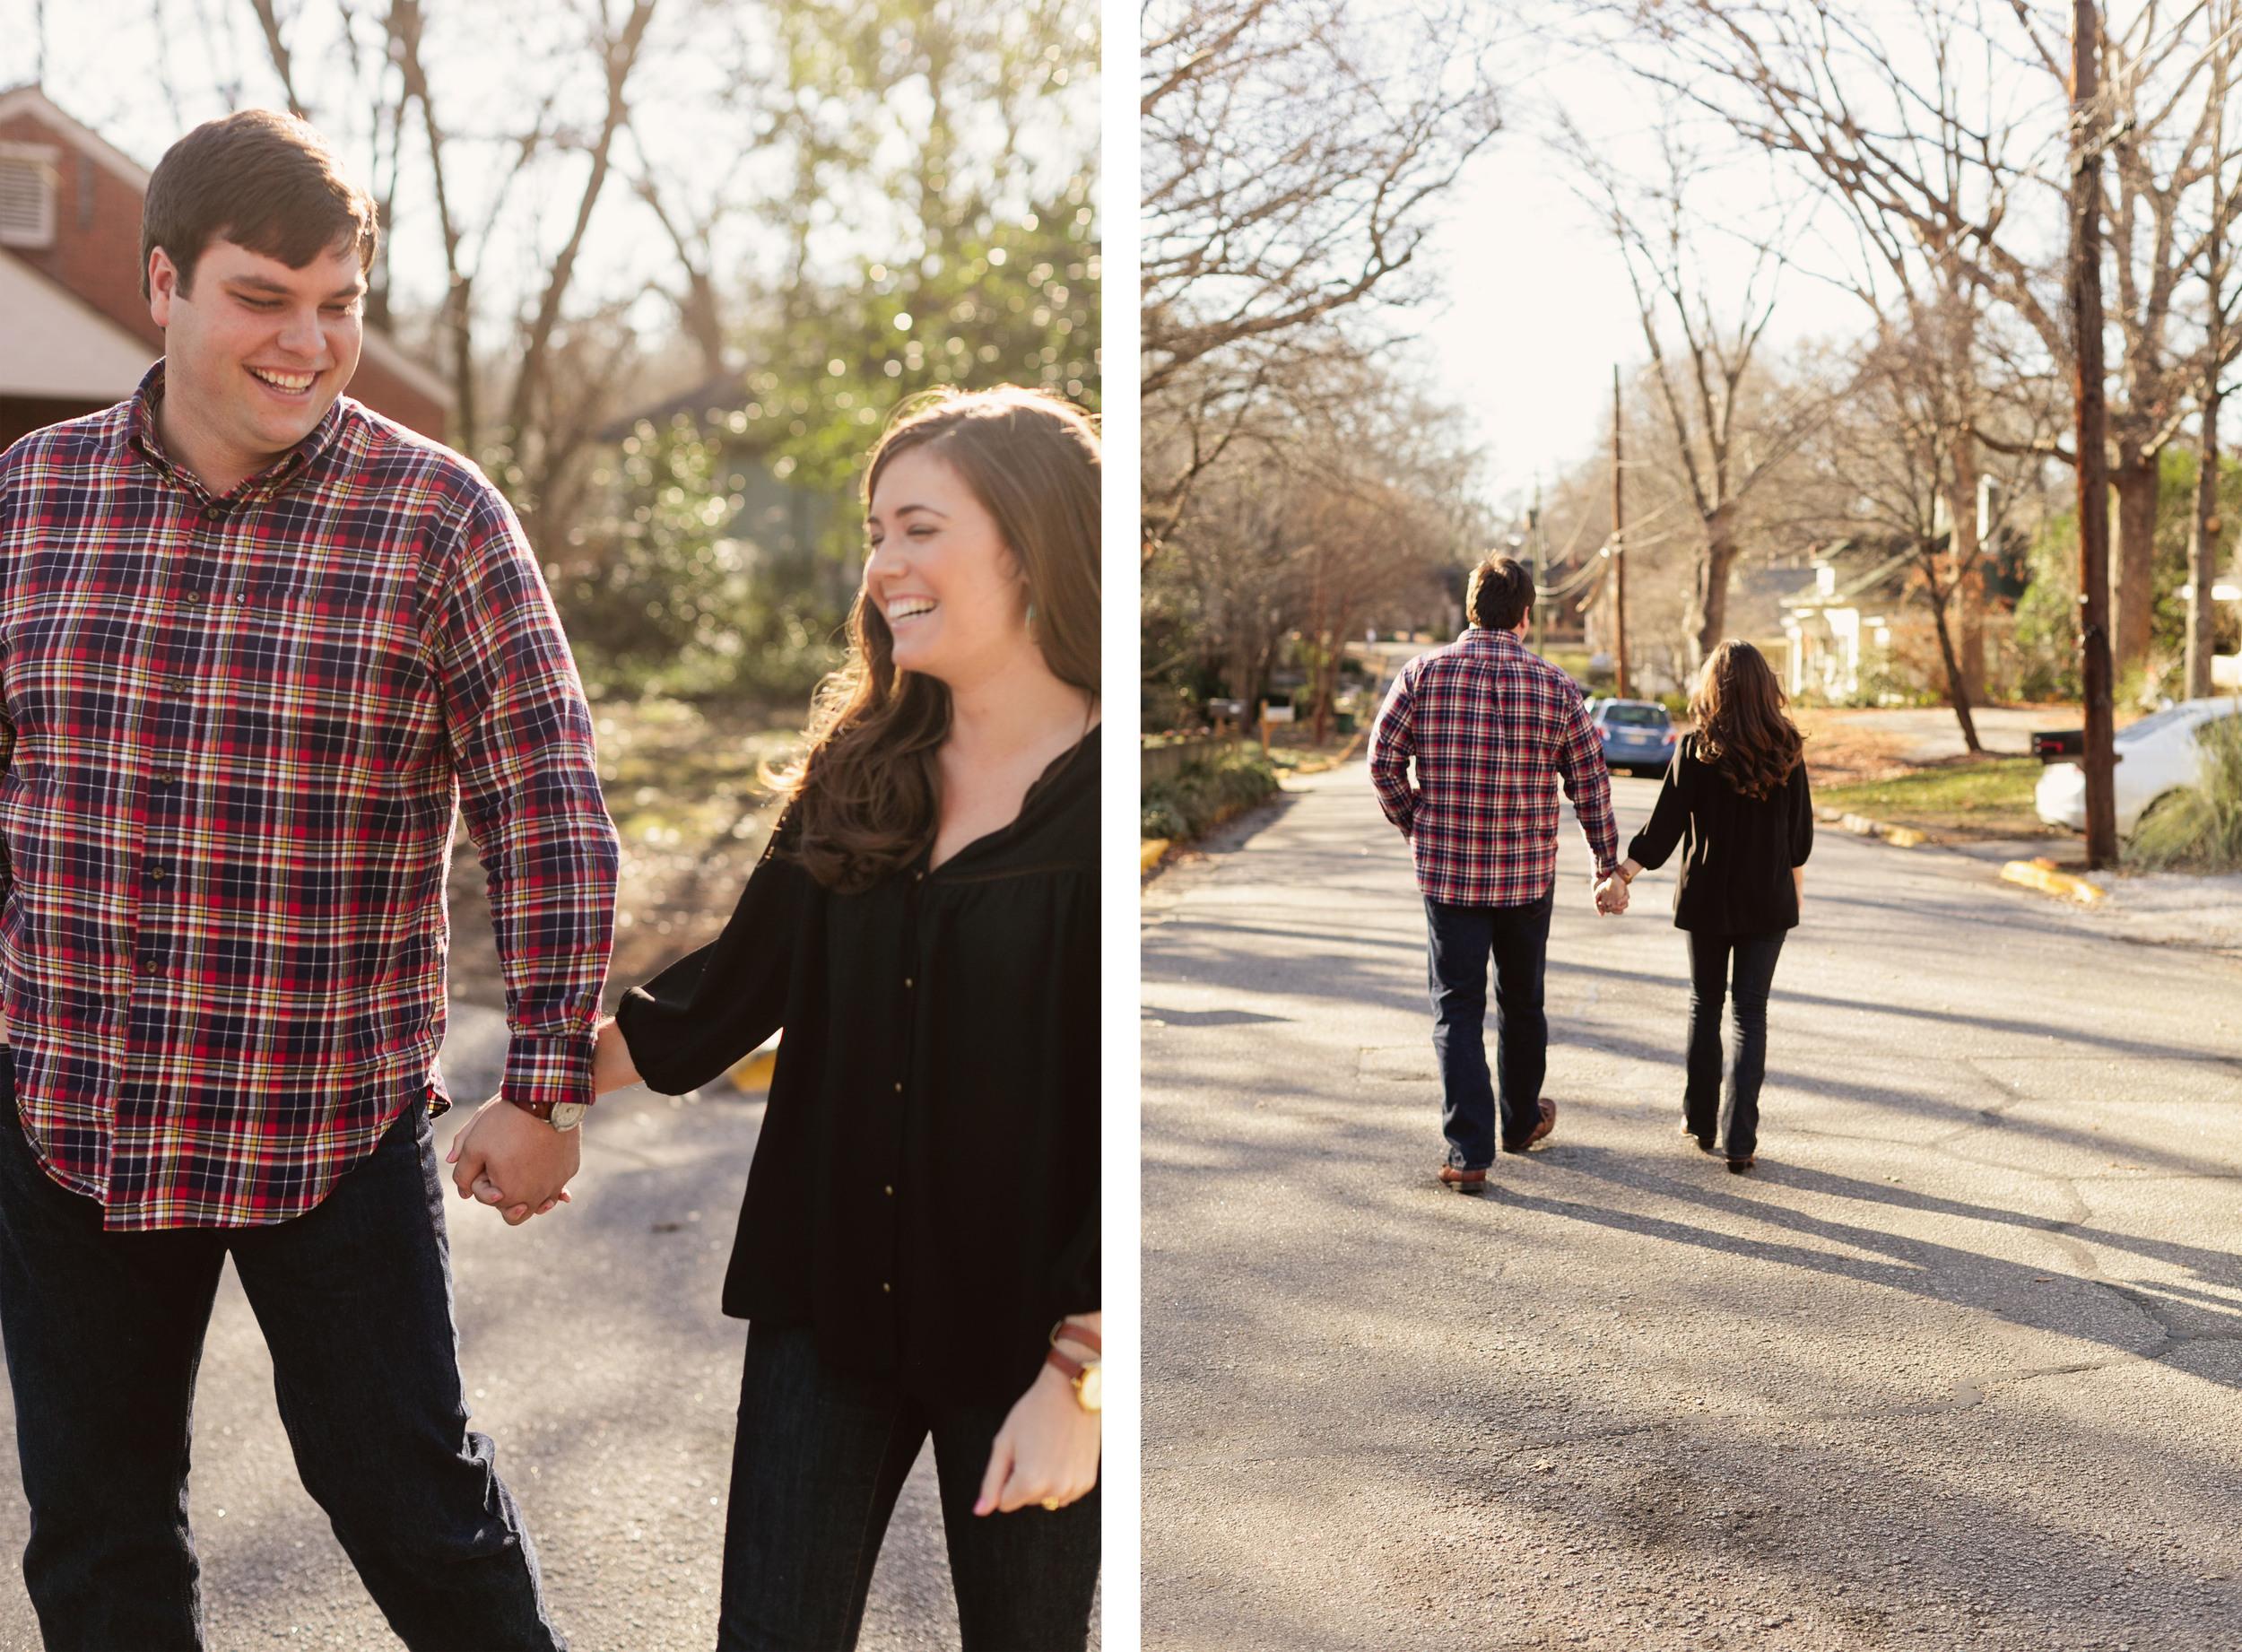 Atlanta-Engagement-Photographer-Kathryn-McCrary-Photography-collage-1.jpg